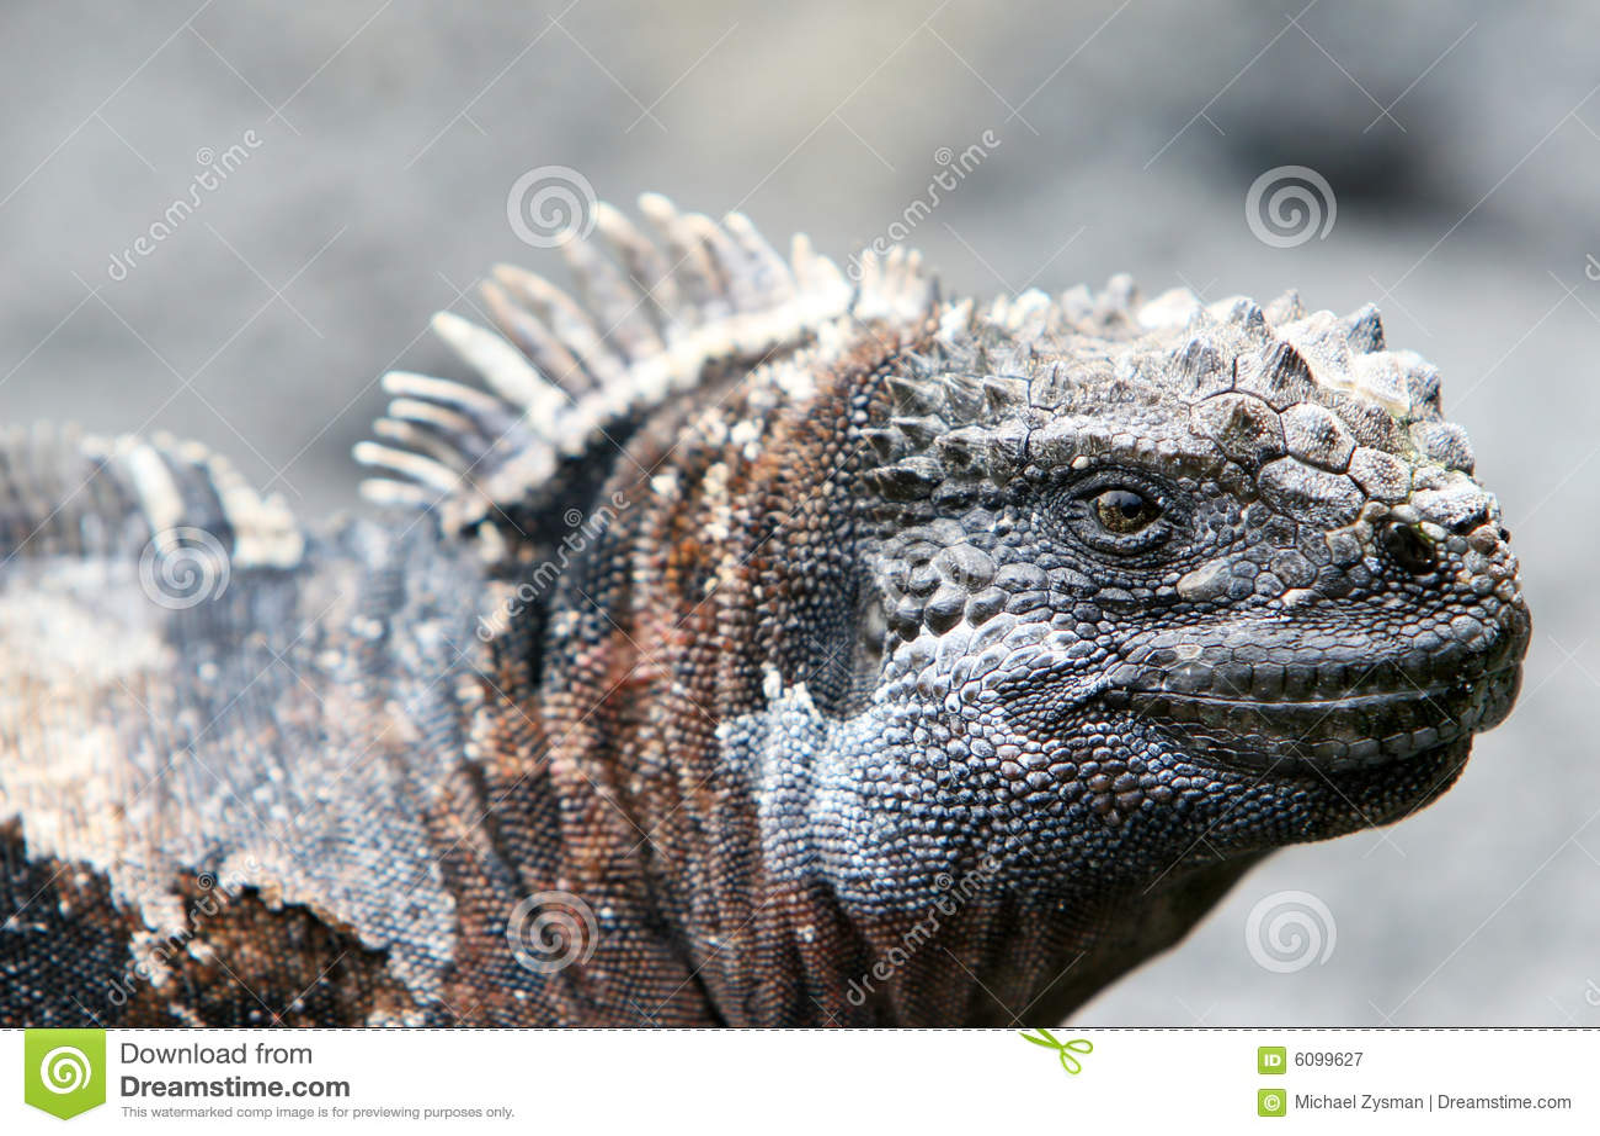 Iguana do fuzileiro naval de Galápagos